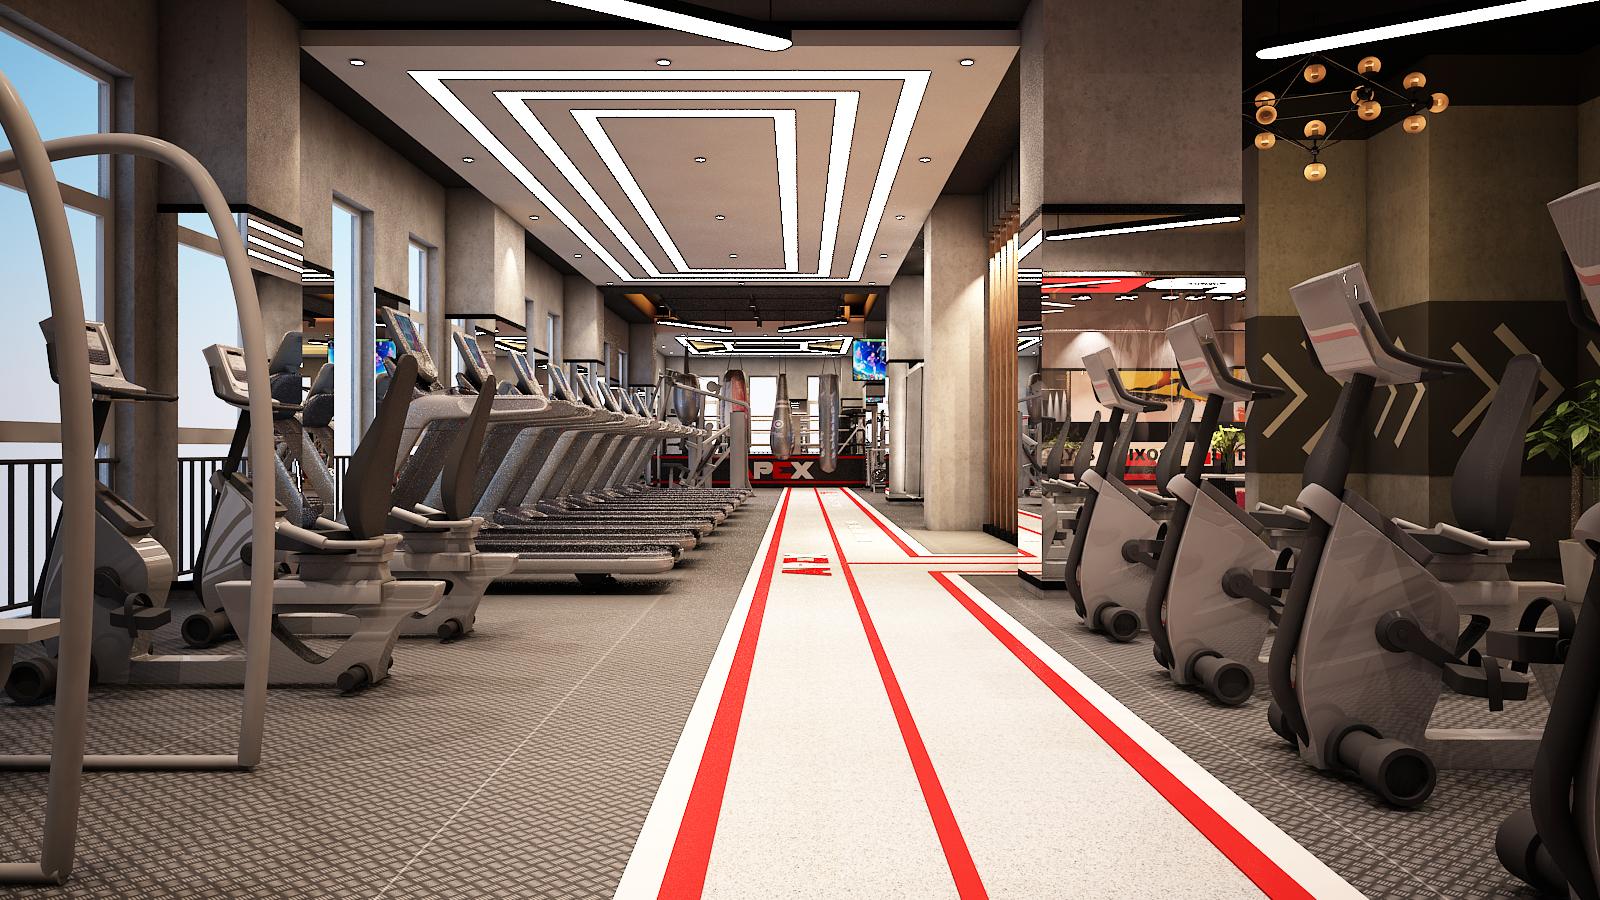 thiet-ke-3d-phong-gym